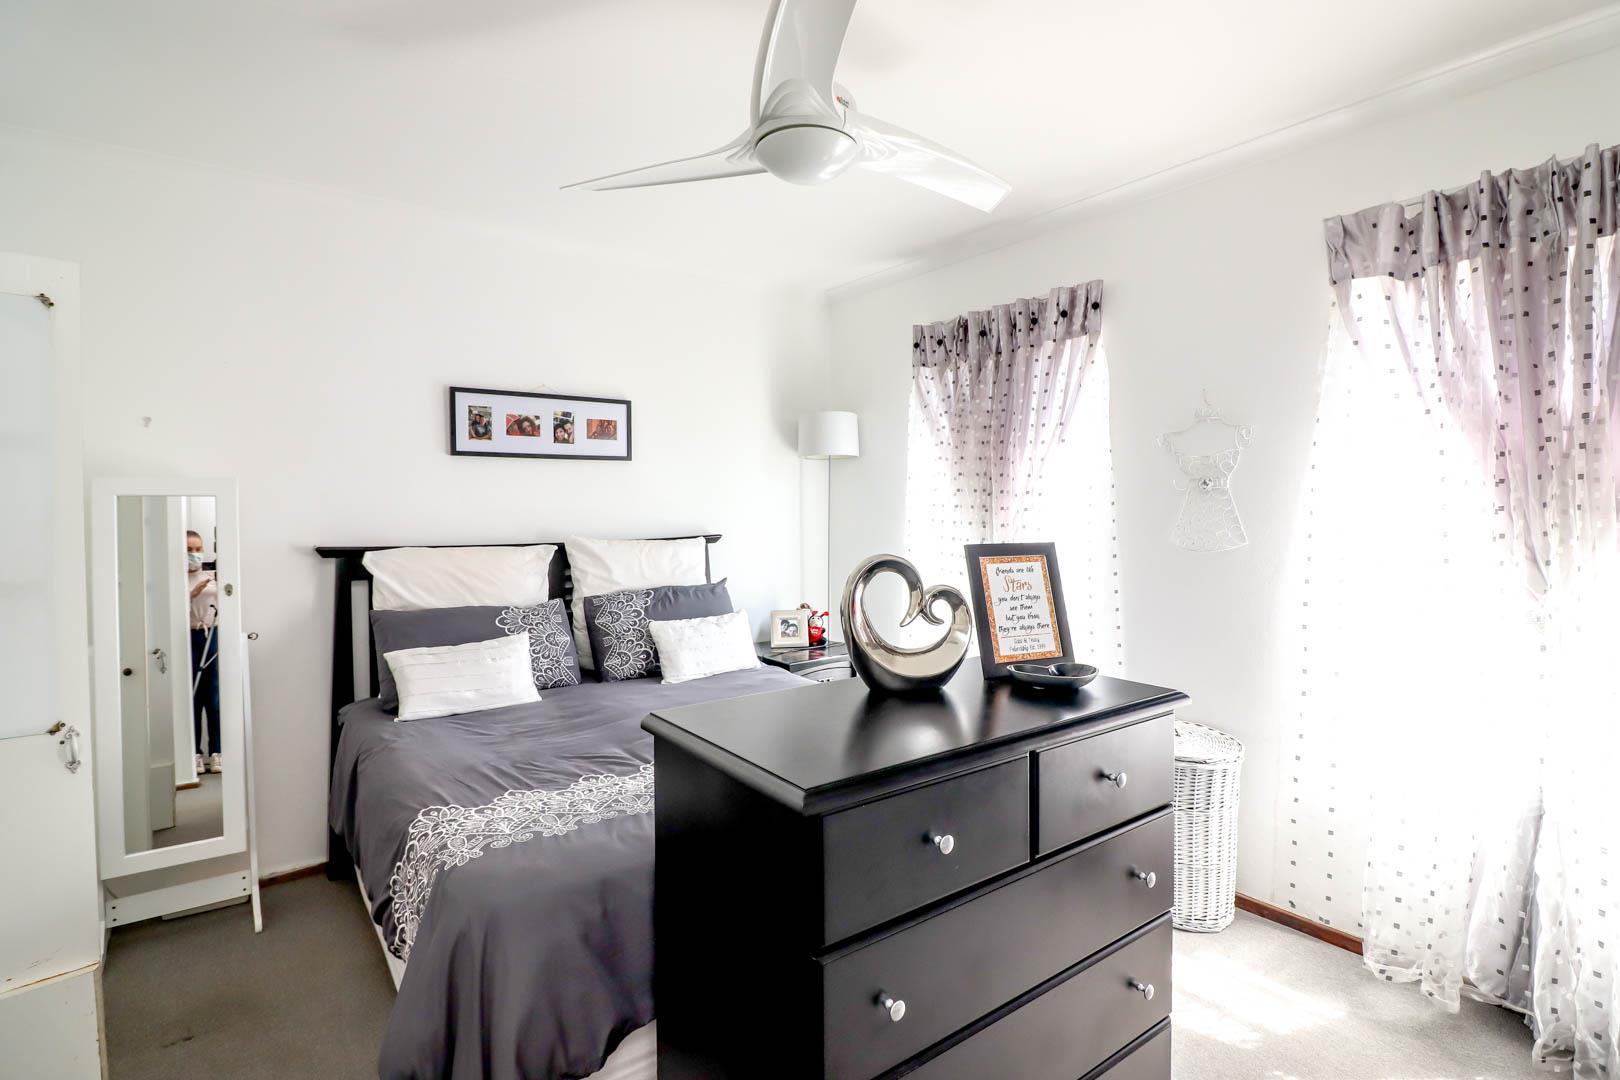 2 Bedroom Townhouse For Sale in Radiokop